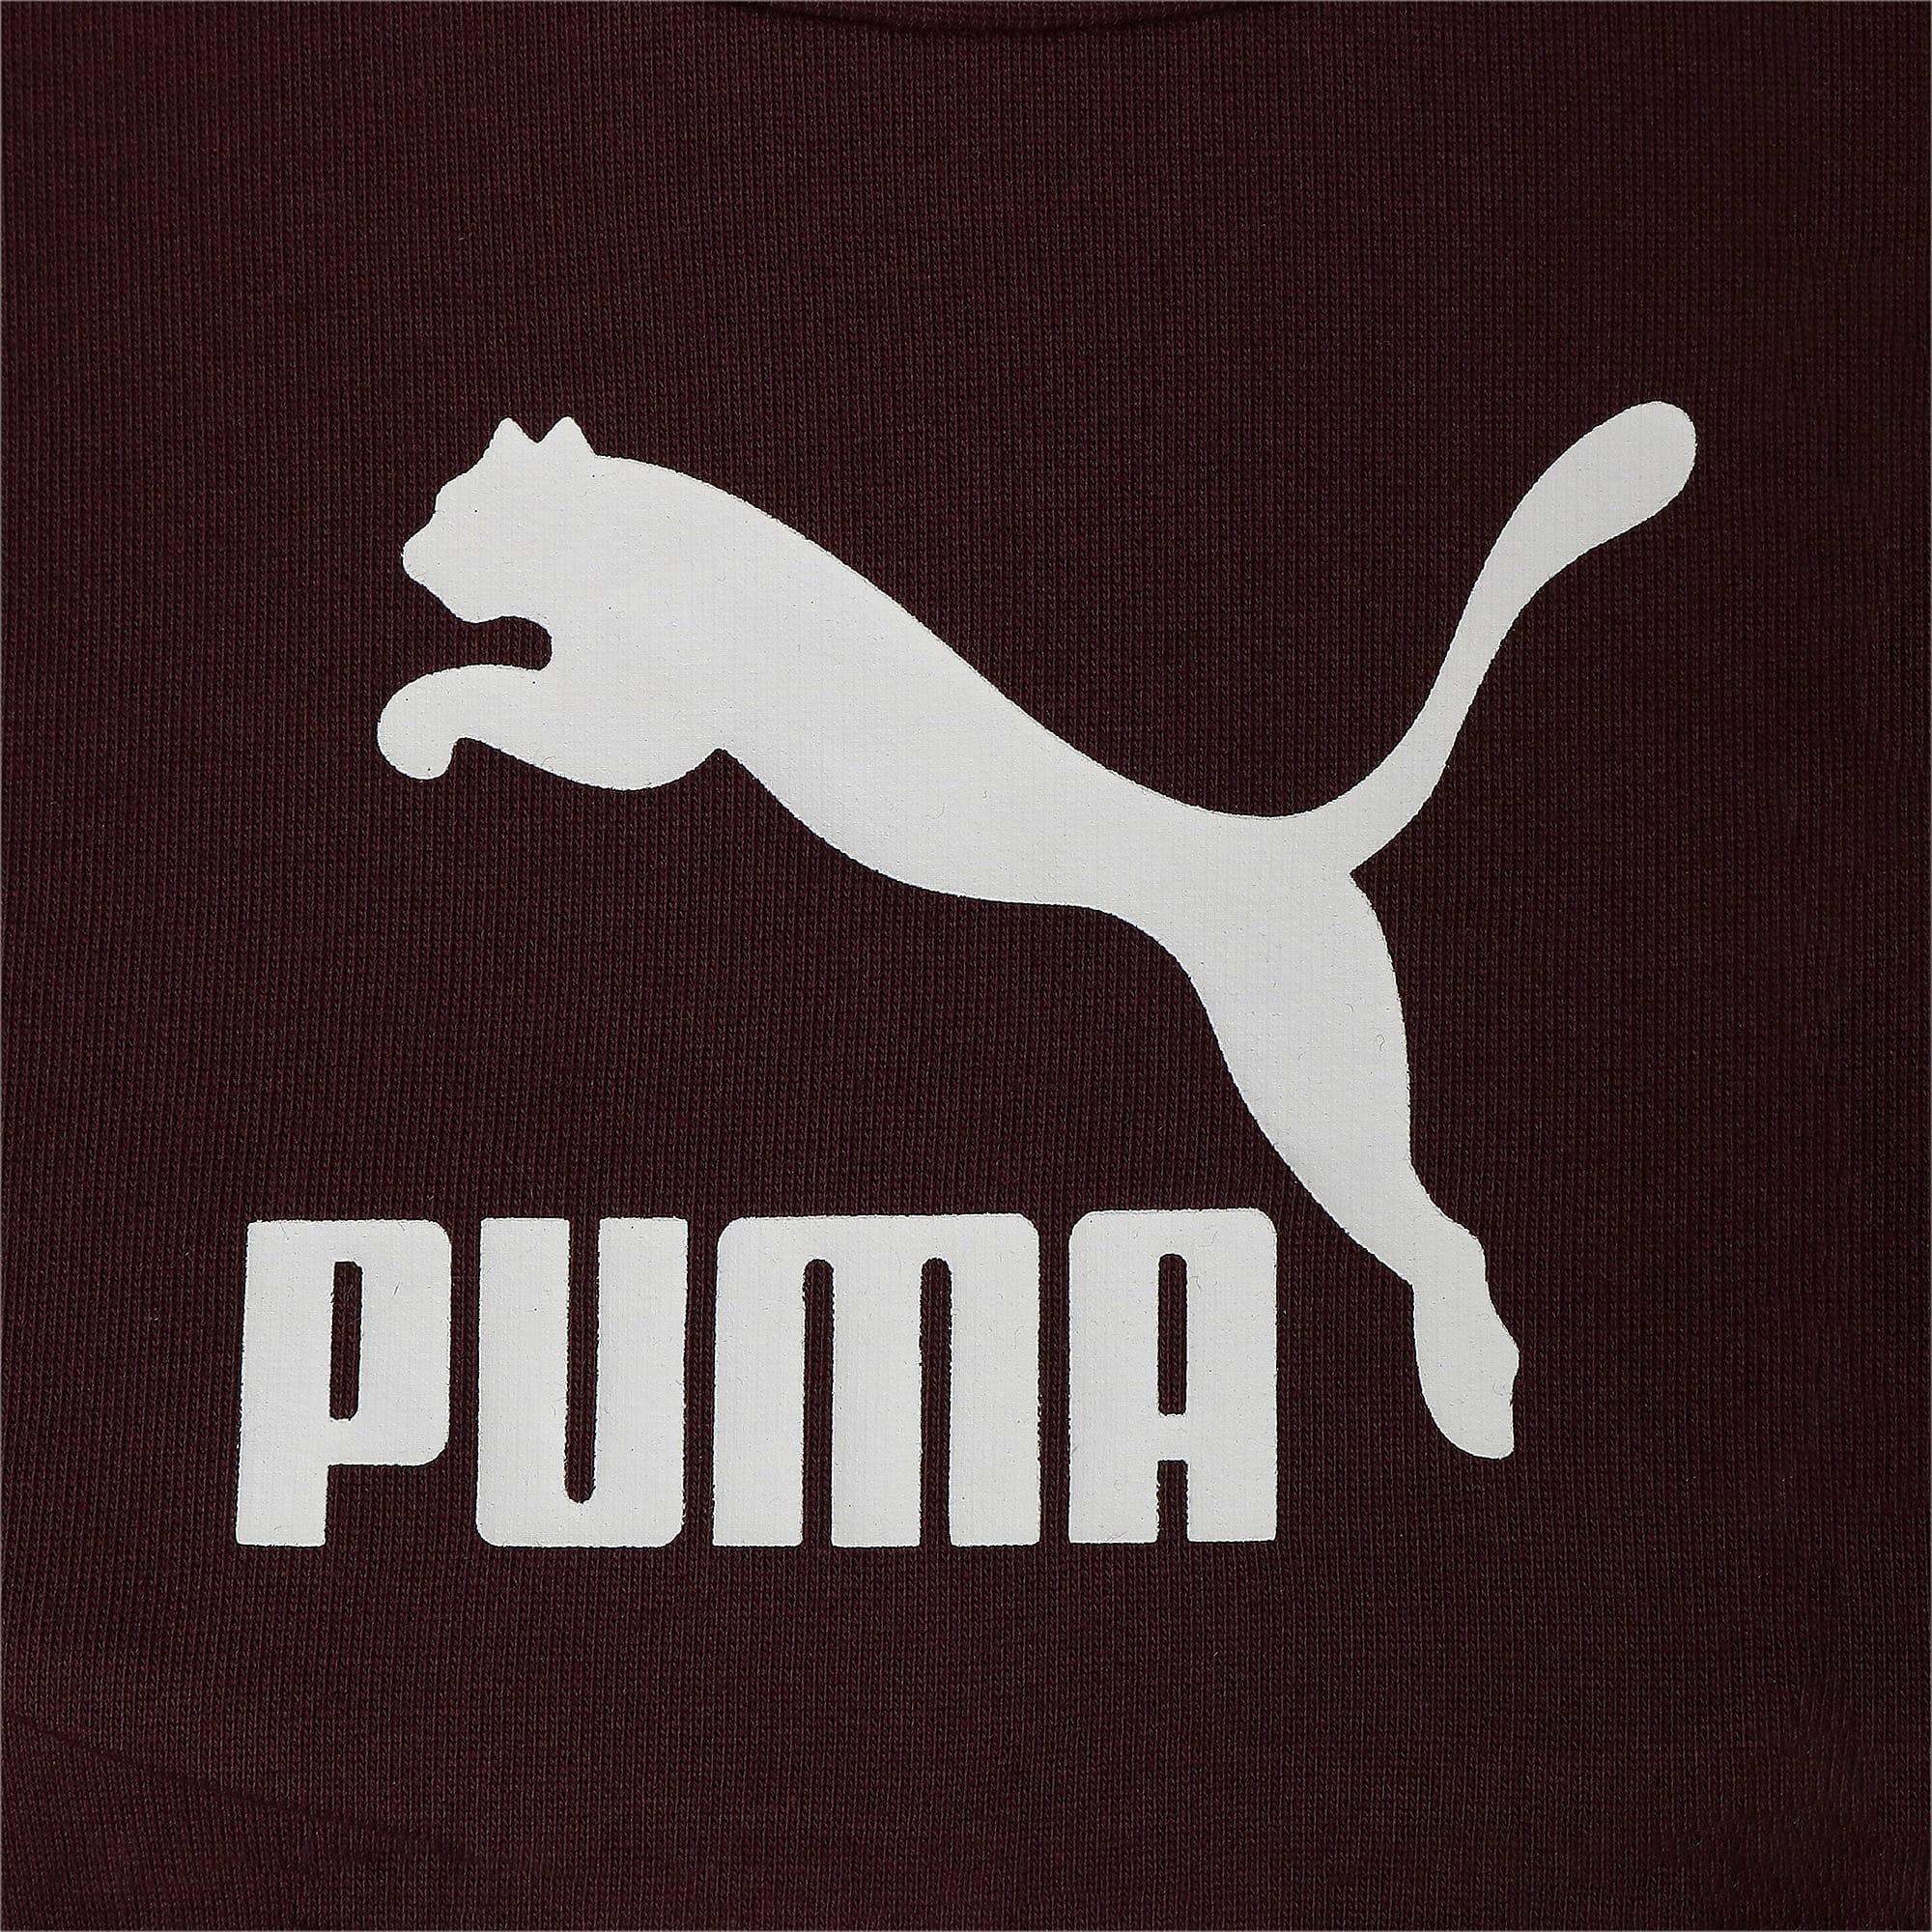 Thumbnail 4 of PUMA x TYAKASHA ウィメンズ タートルネック, Vineyard Wine, medium-JPN